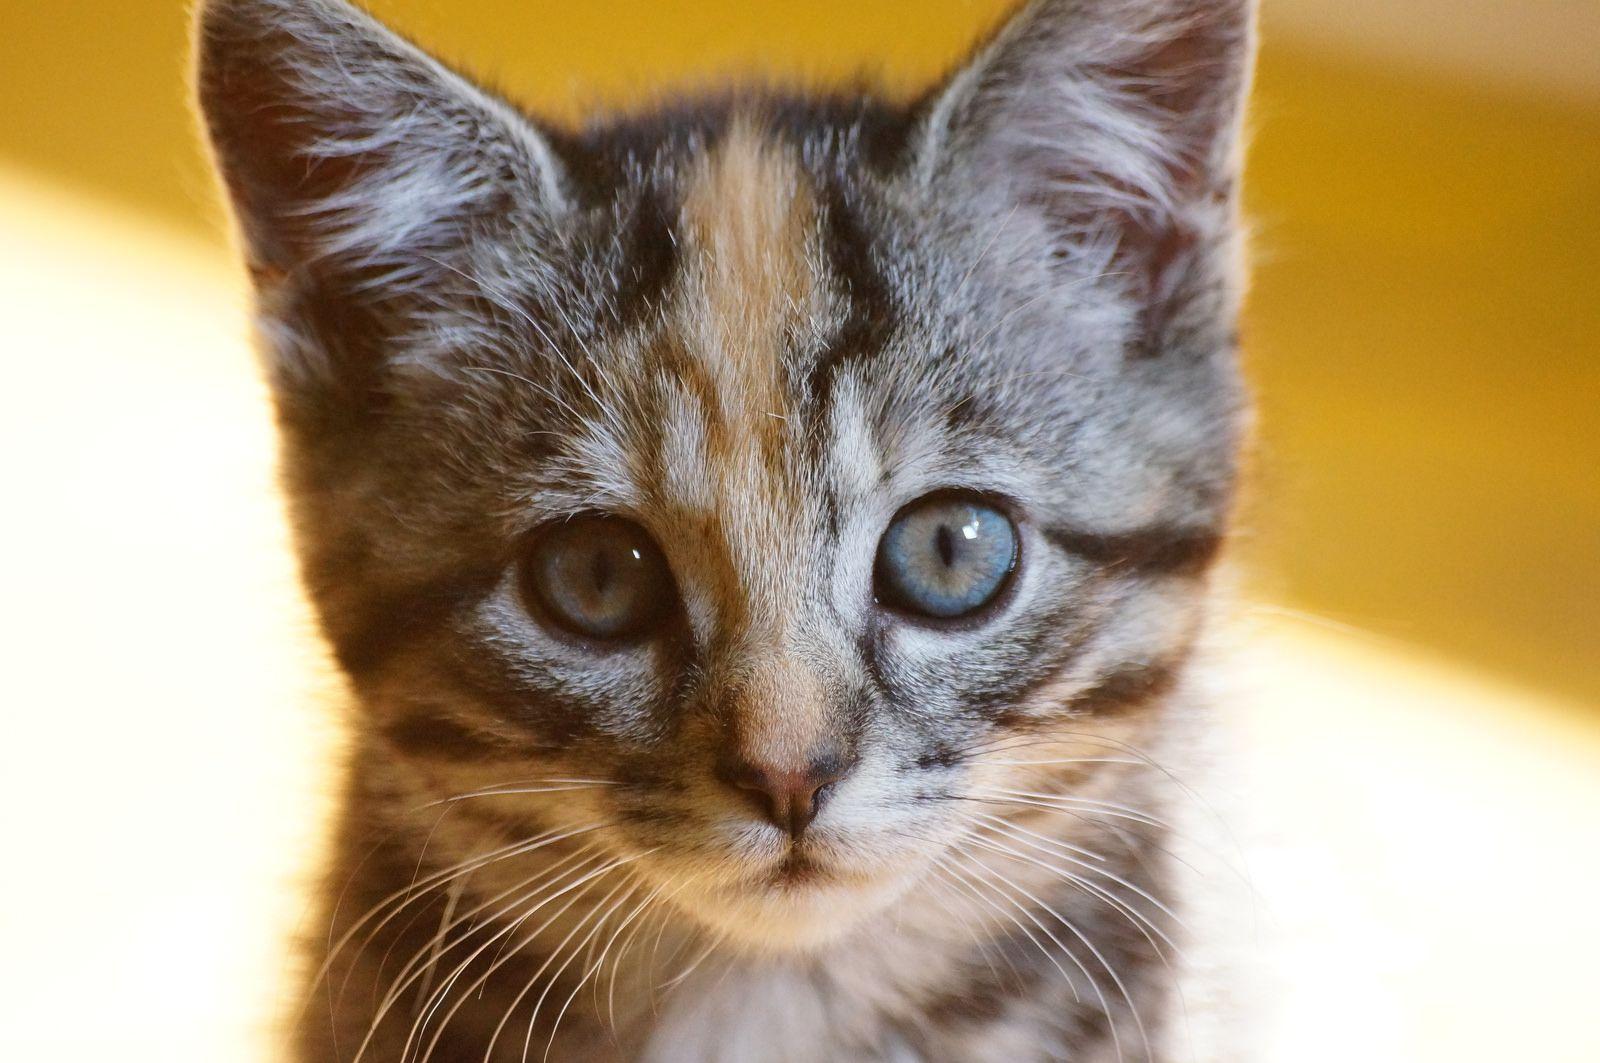 Pluks kittens Cute animals, Fancy cats, Raising kittens